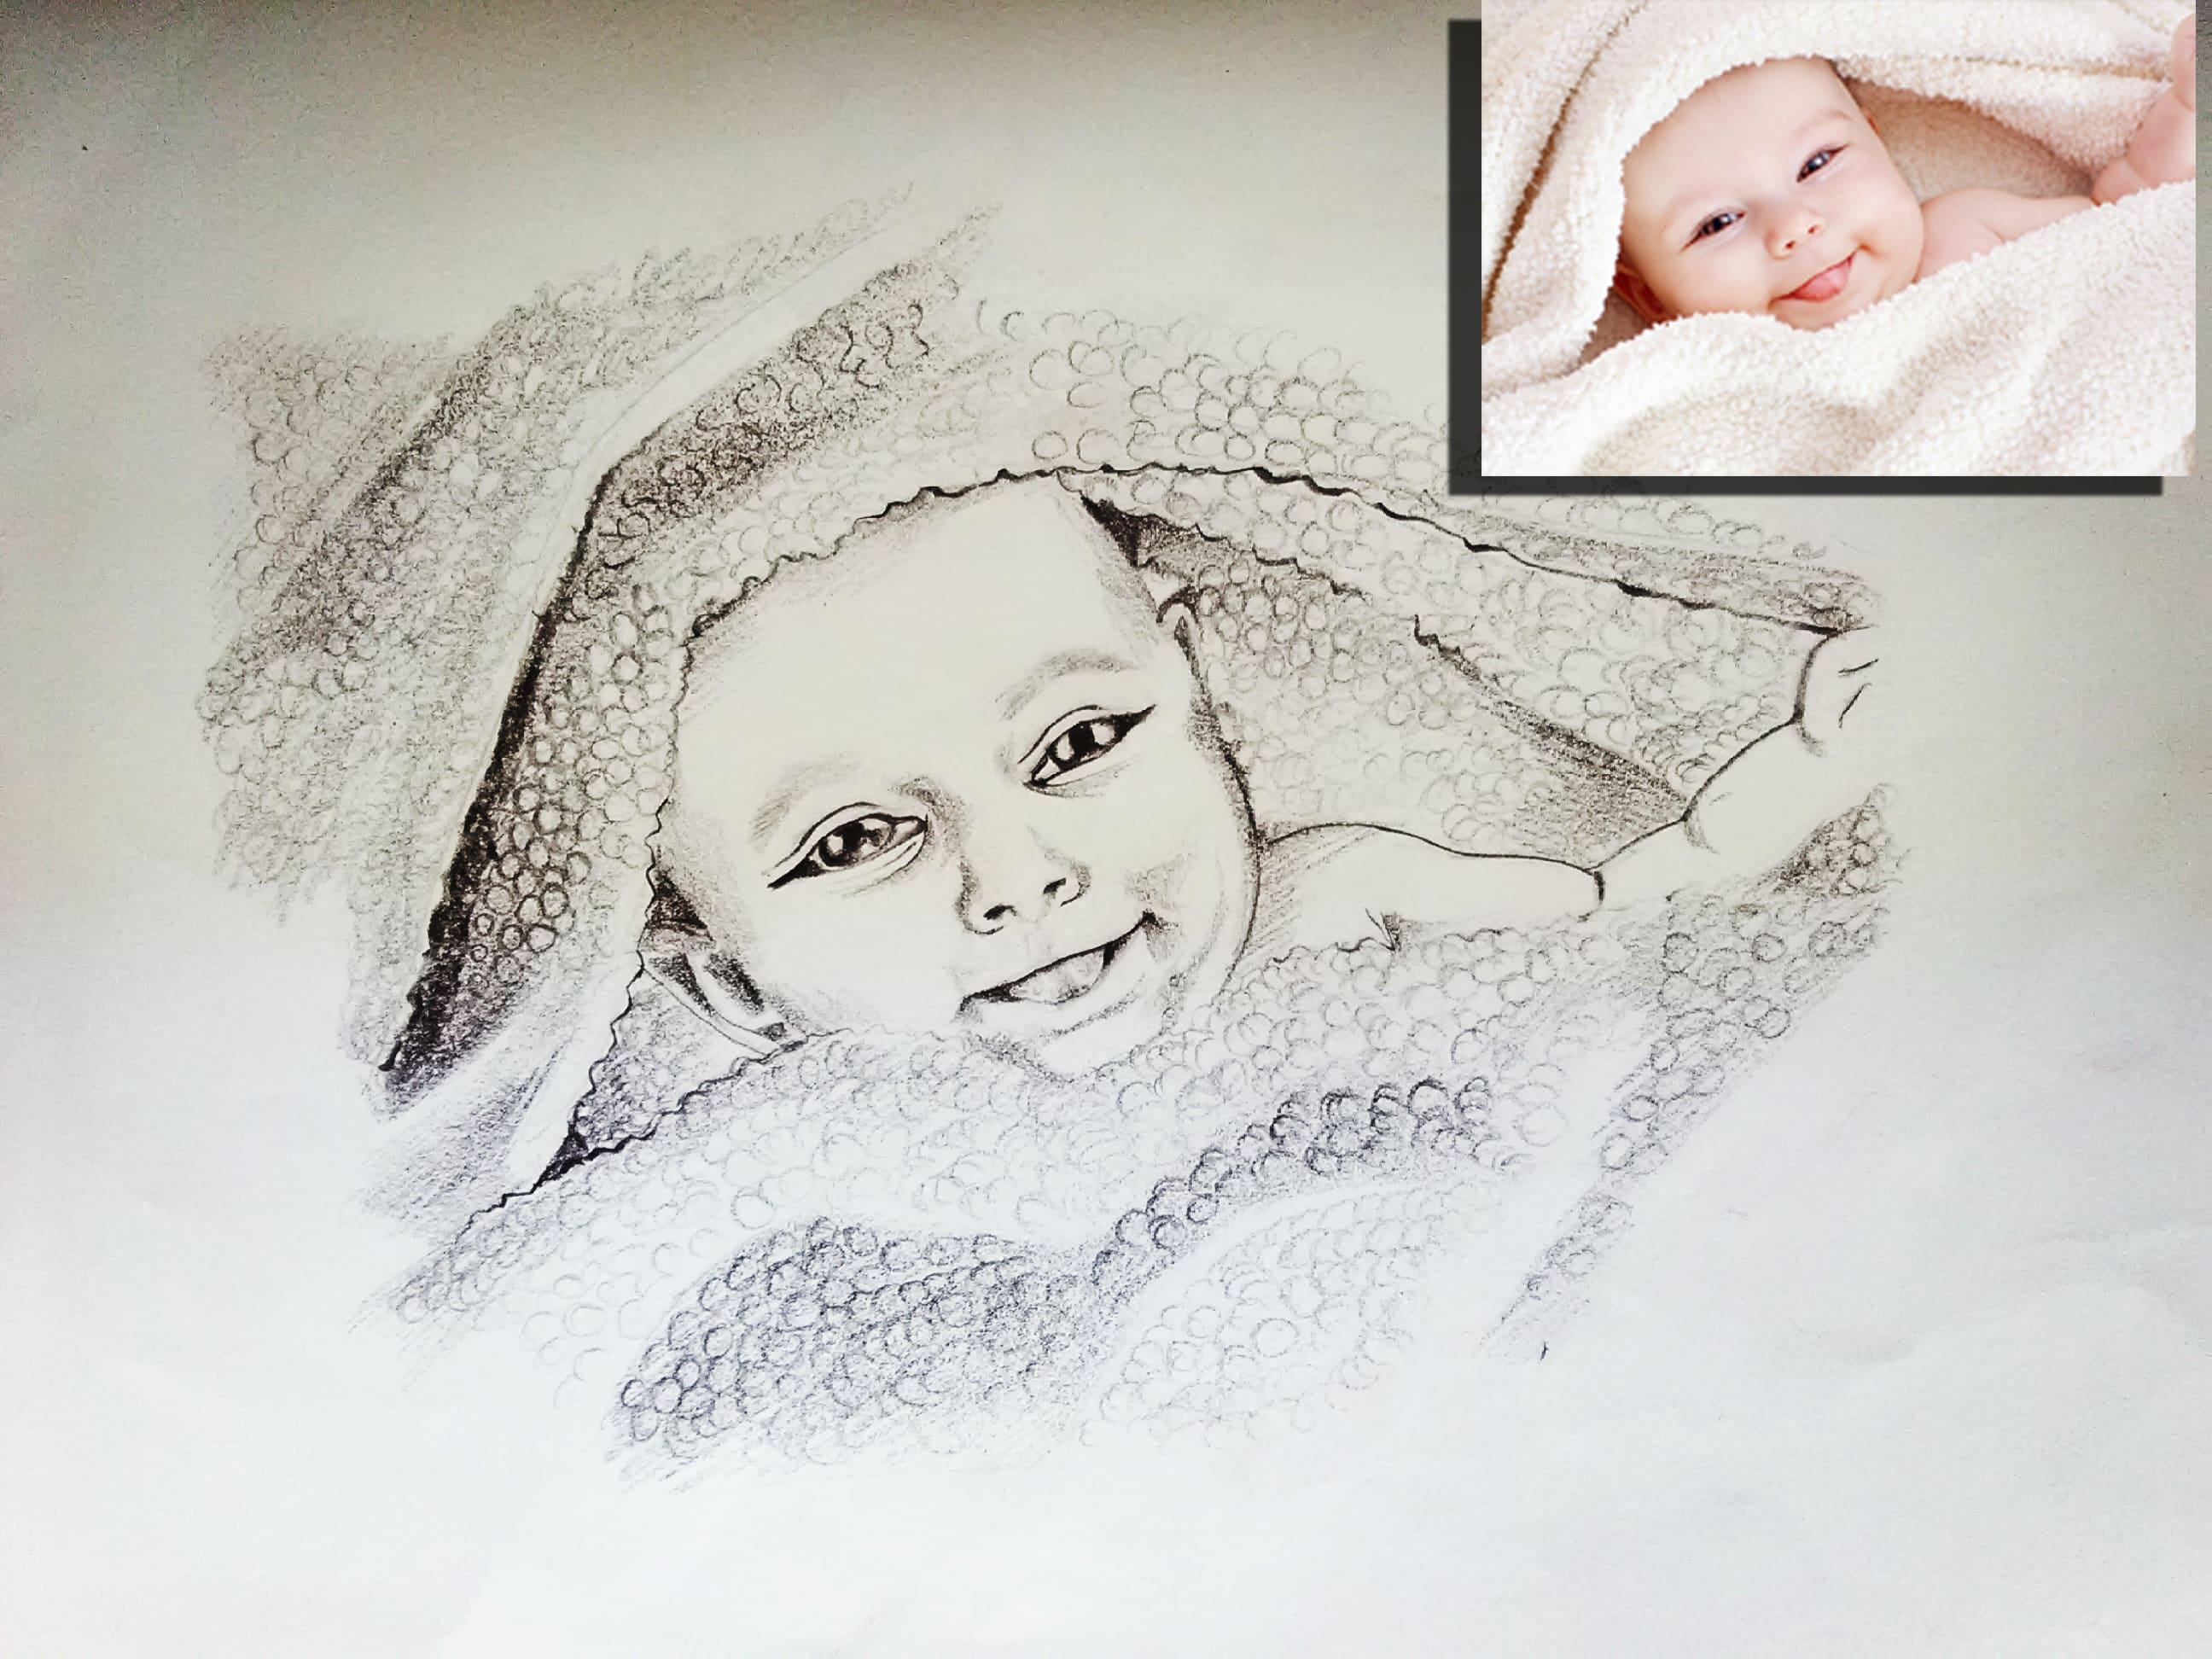 I will draw realistic pencil sketch portrait